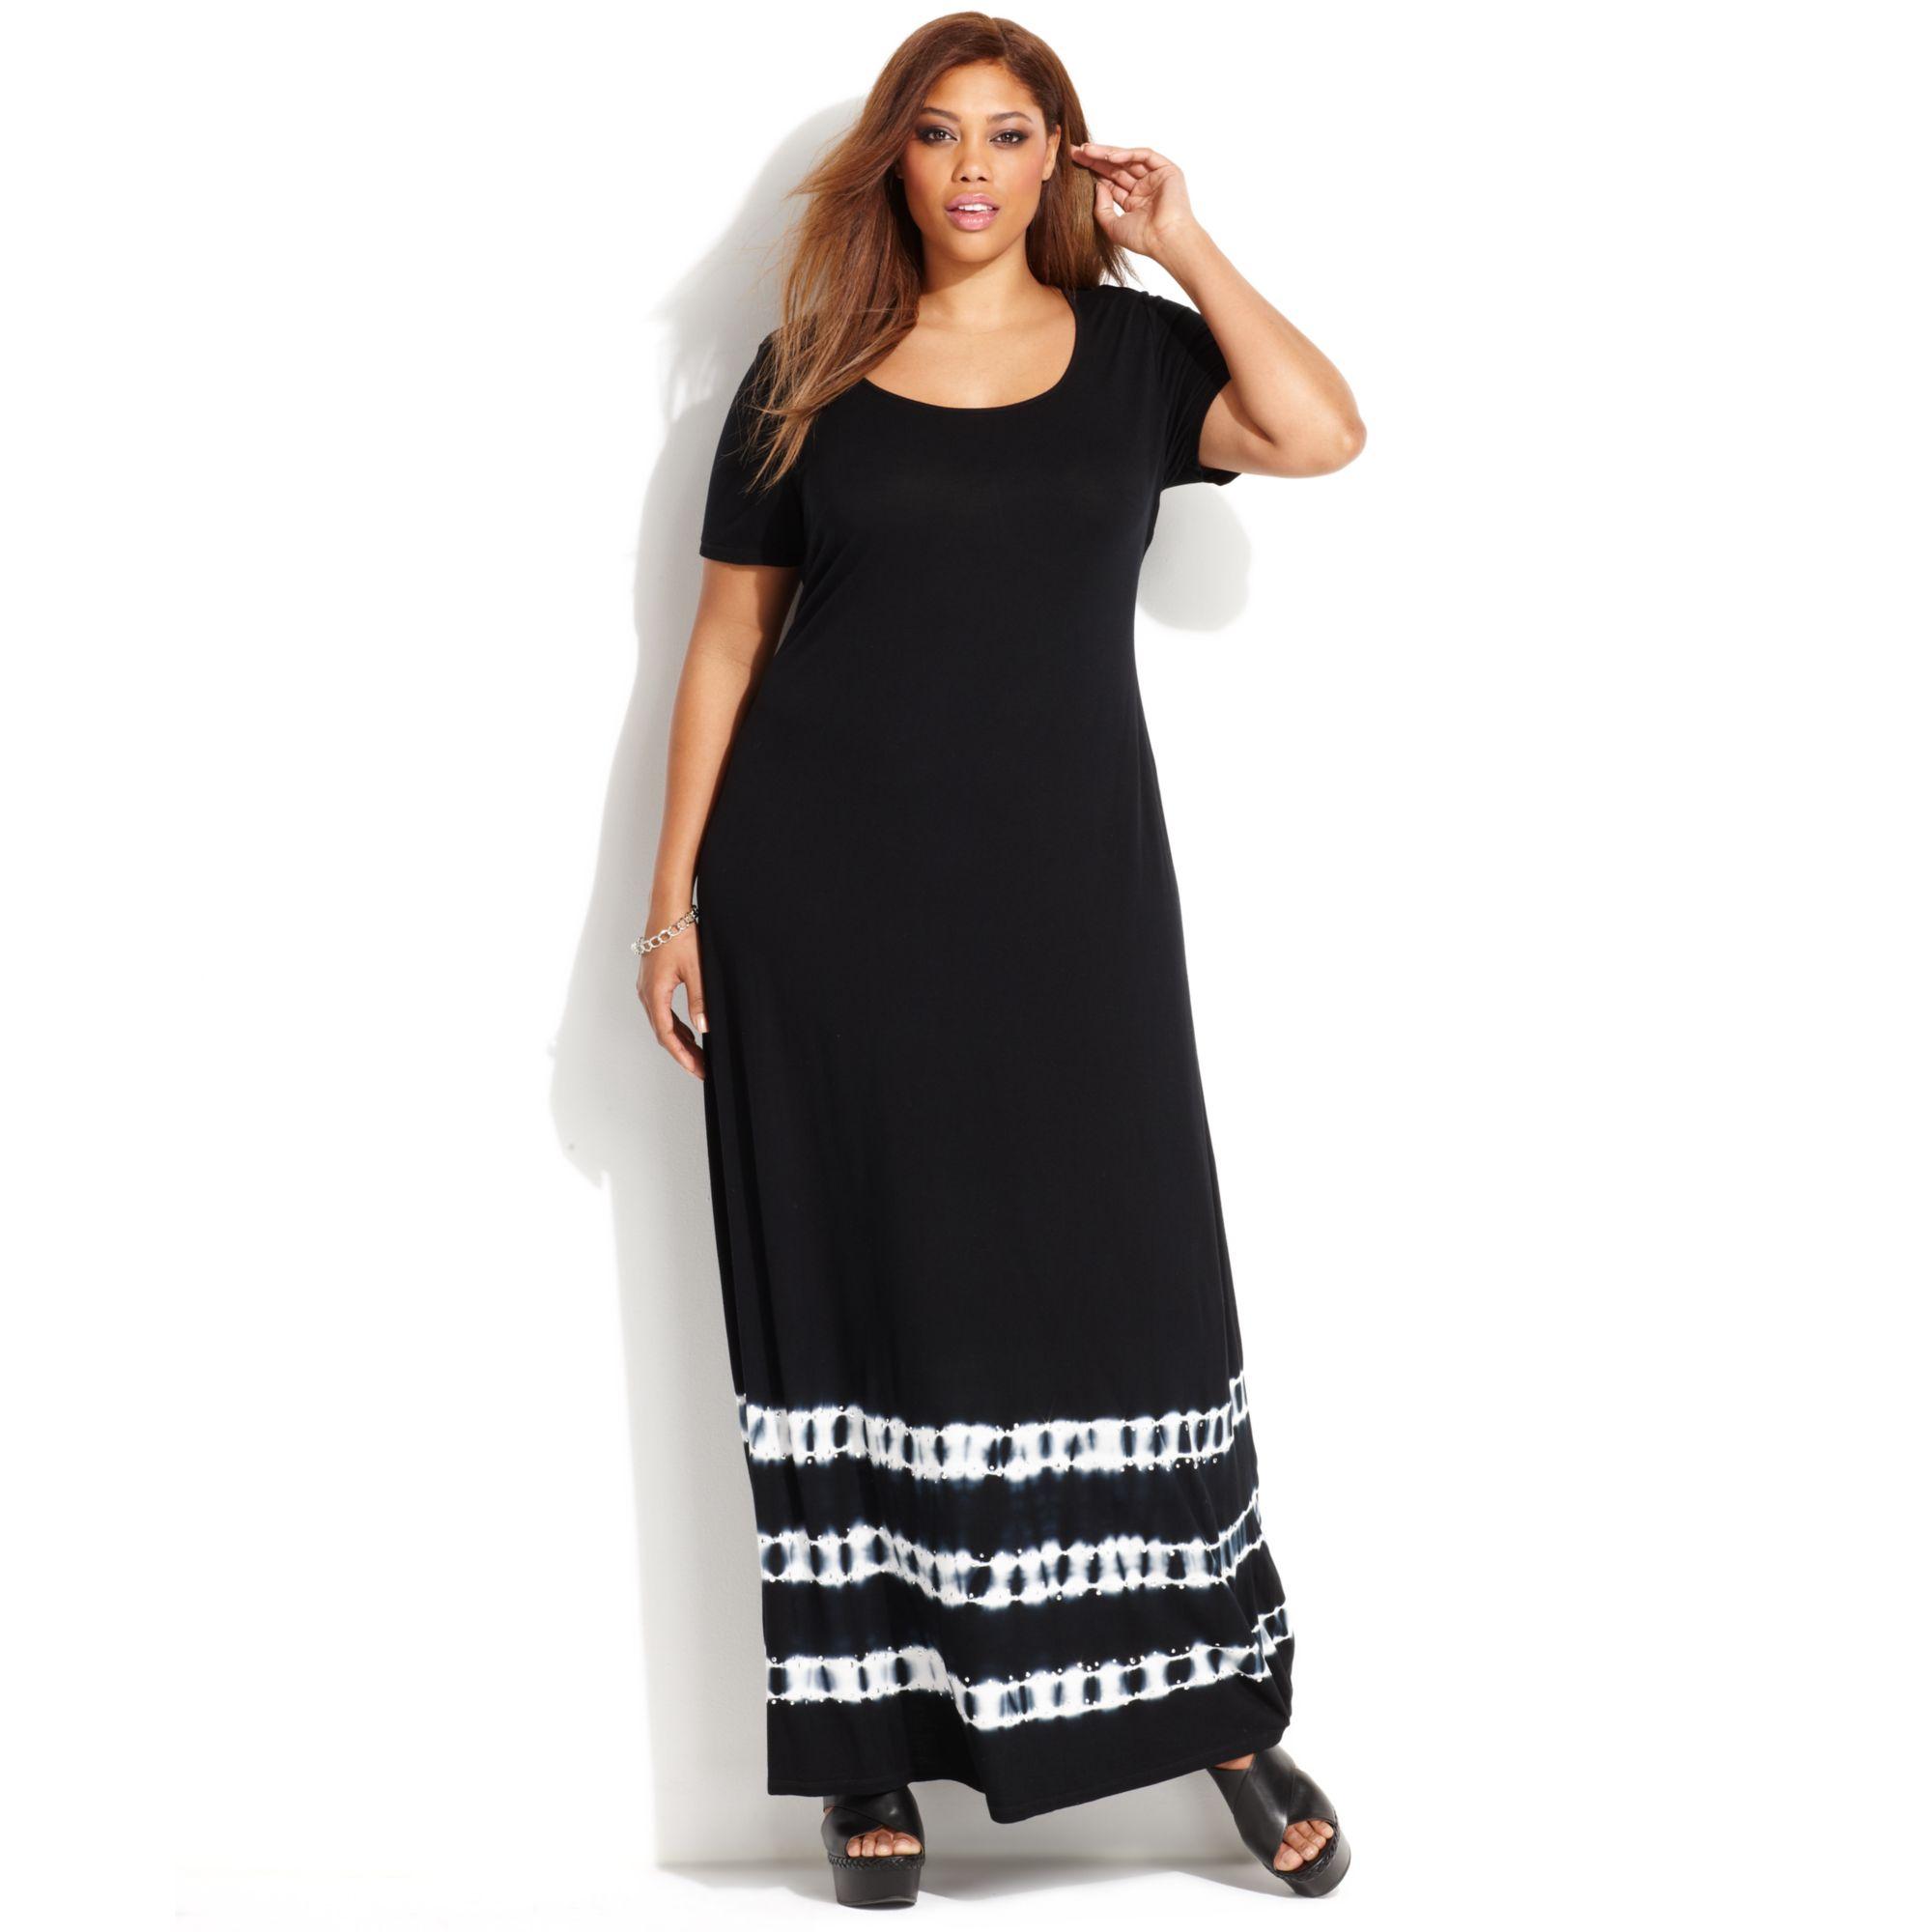 0ebb89c607323 Lyst - INC International Concepts Plus Size Tiedye Maxi Tshirt Dress ...